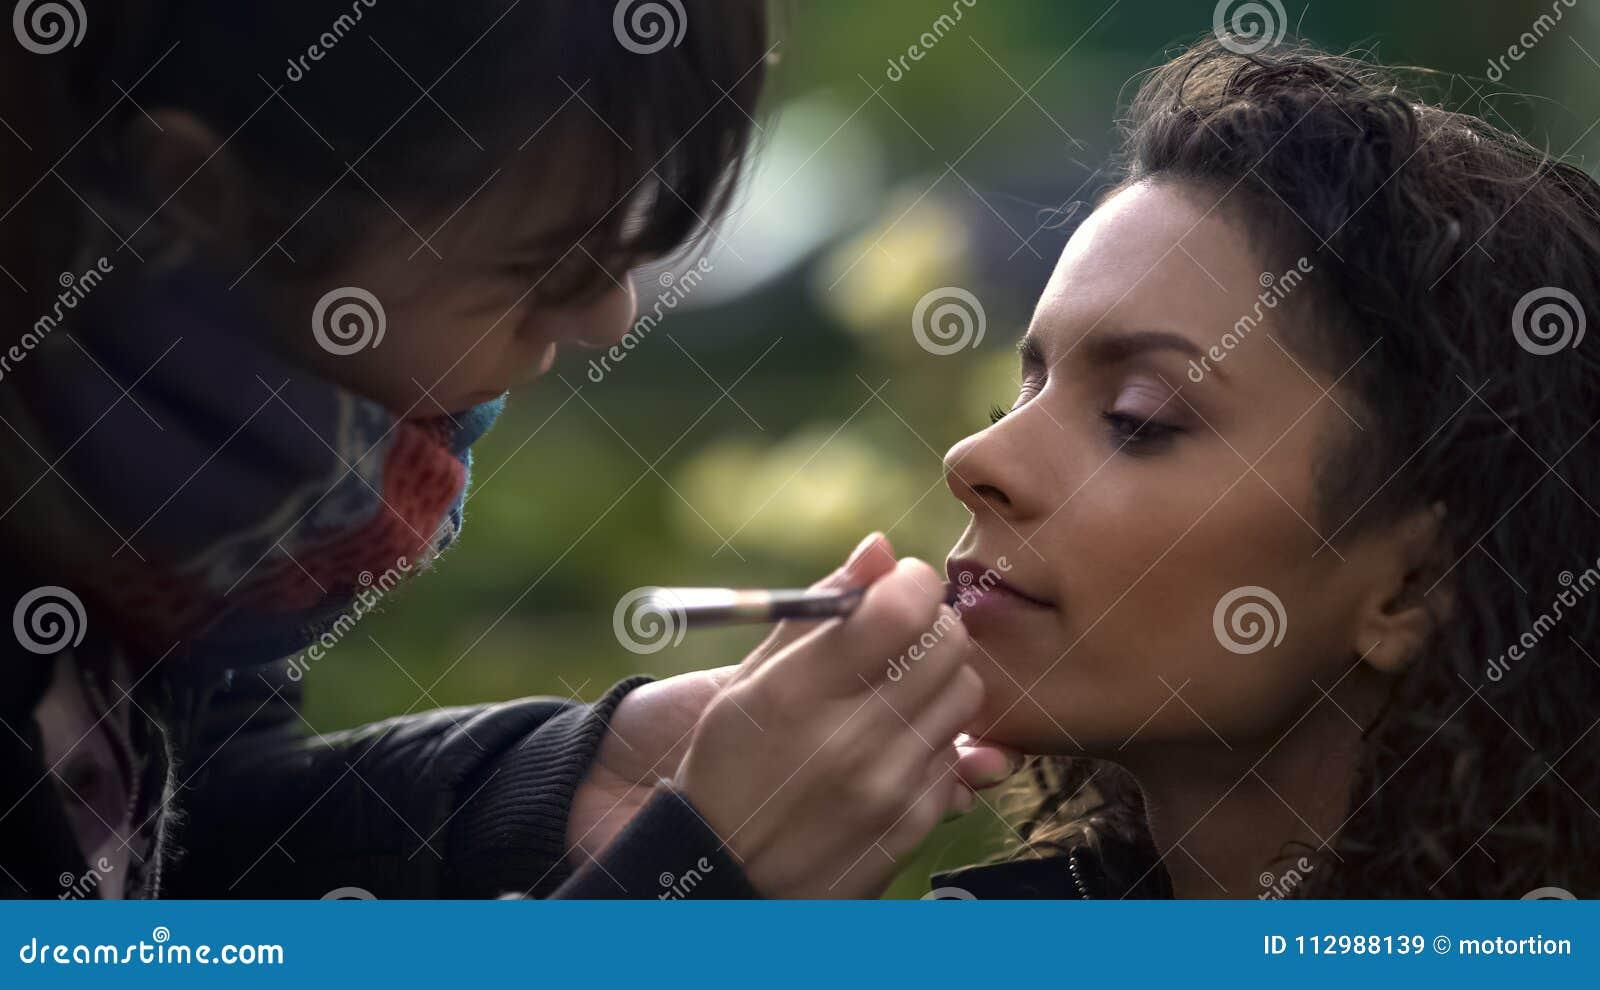 Make-up artist applying lipstick on models lips, natural beauty of biracial lady